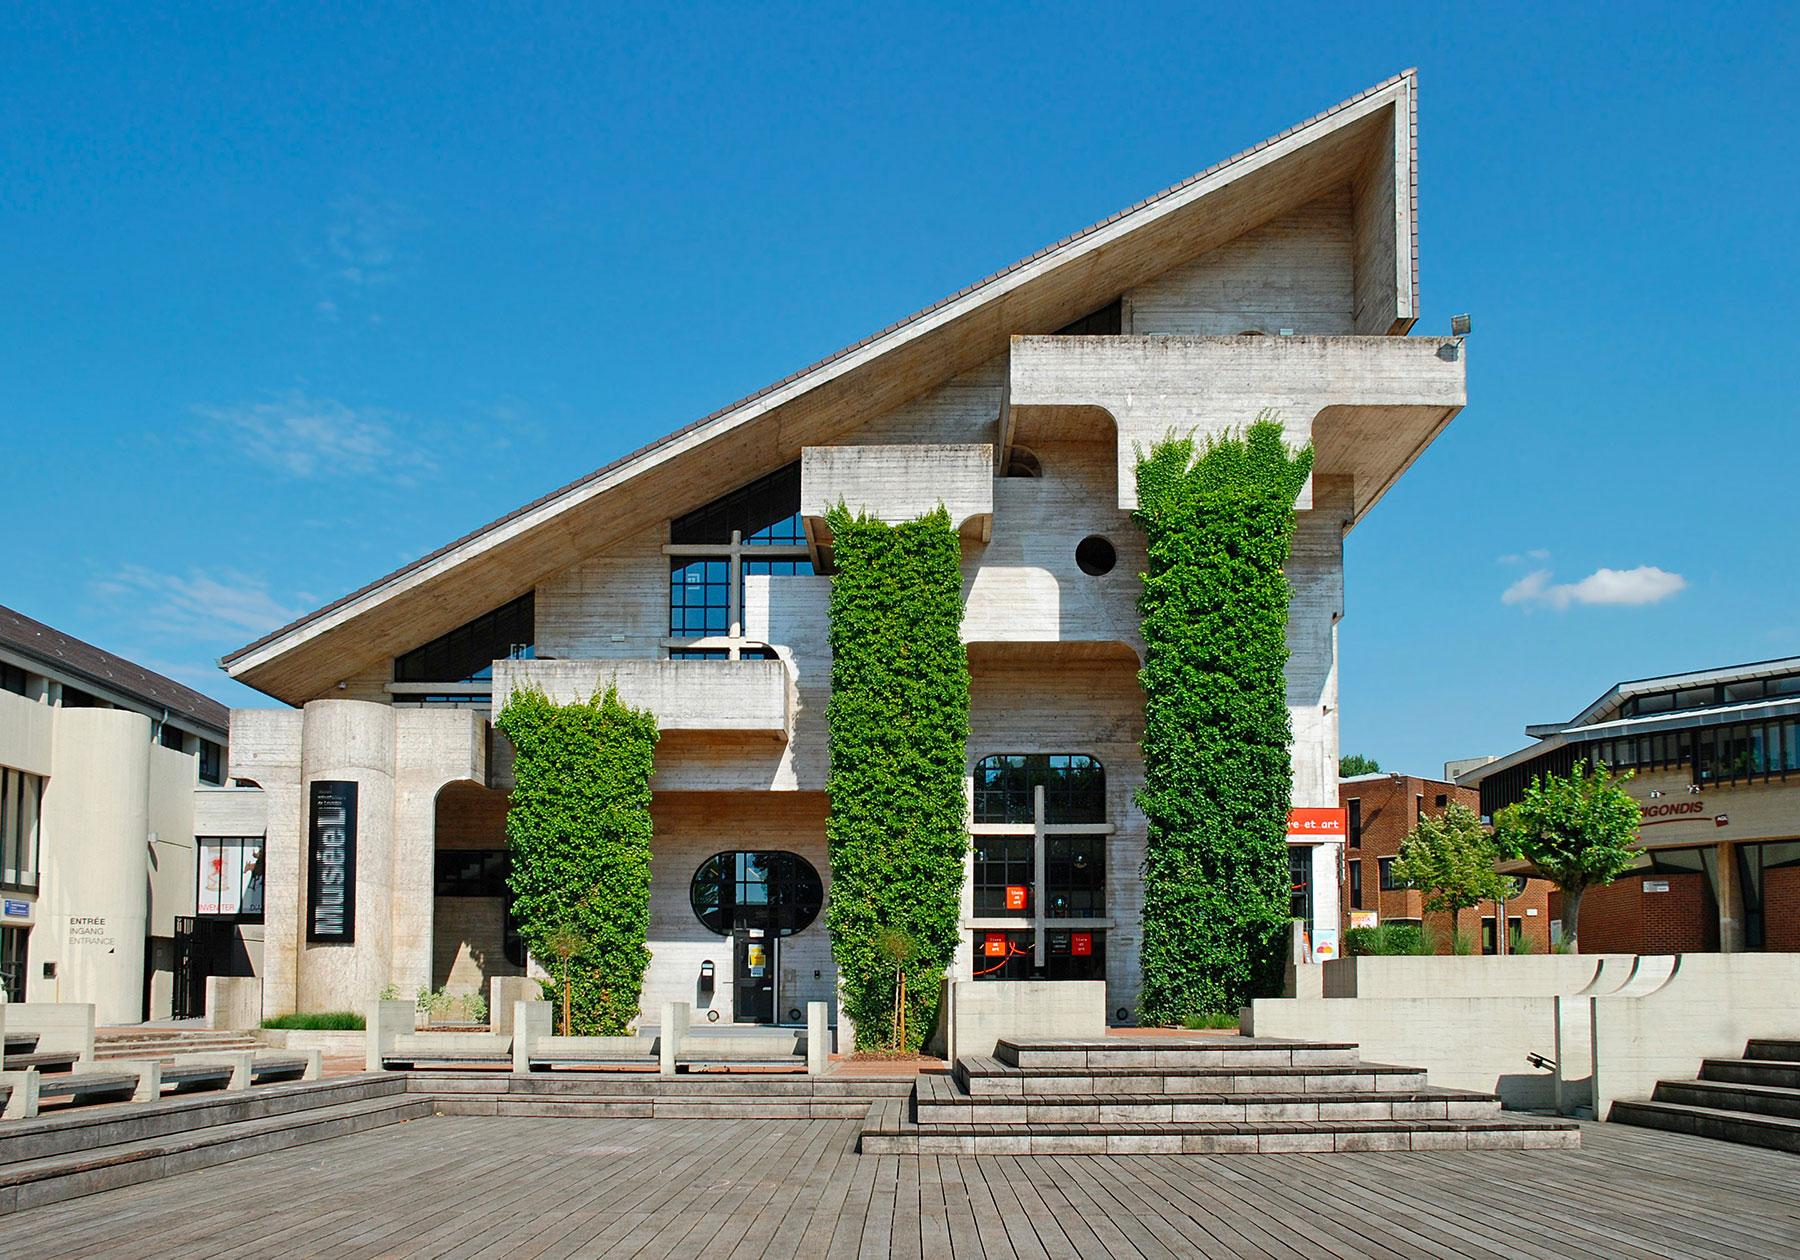 Het Musée L in Louvain-la-Neuve